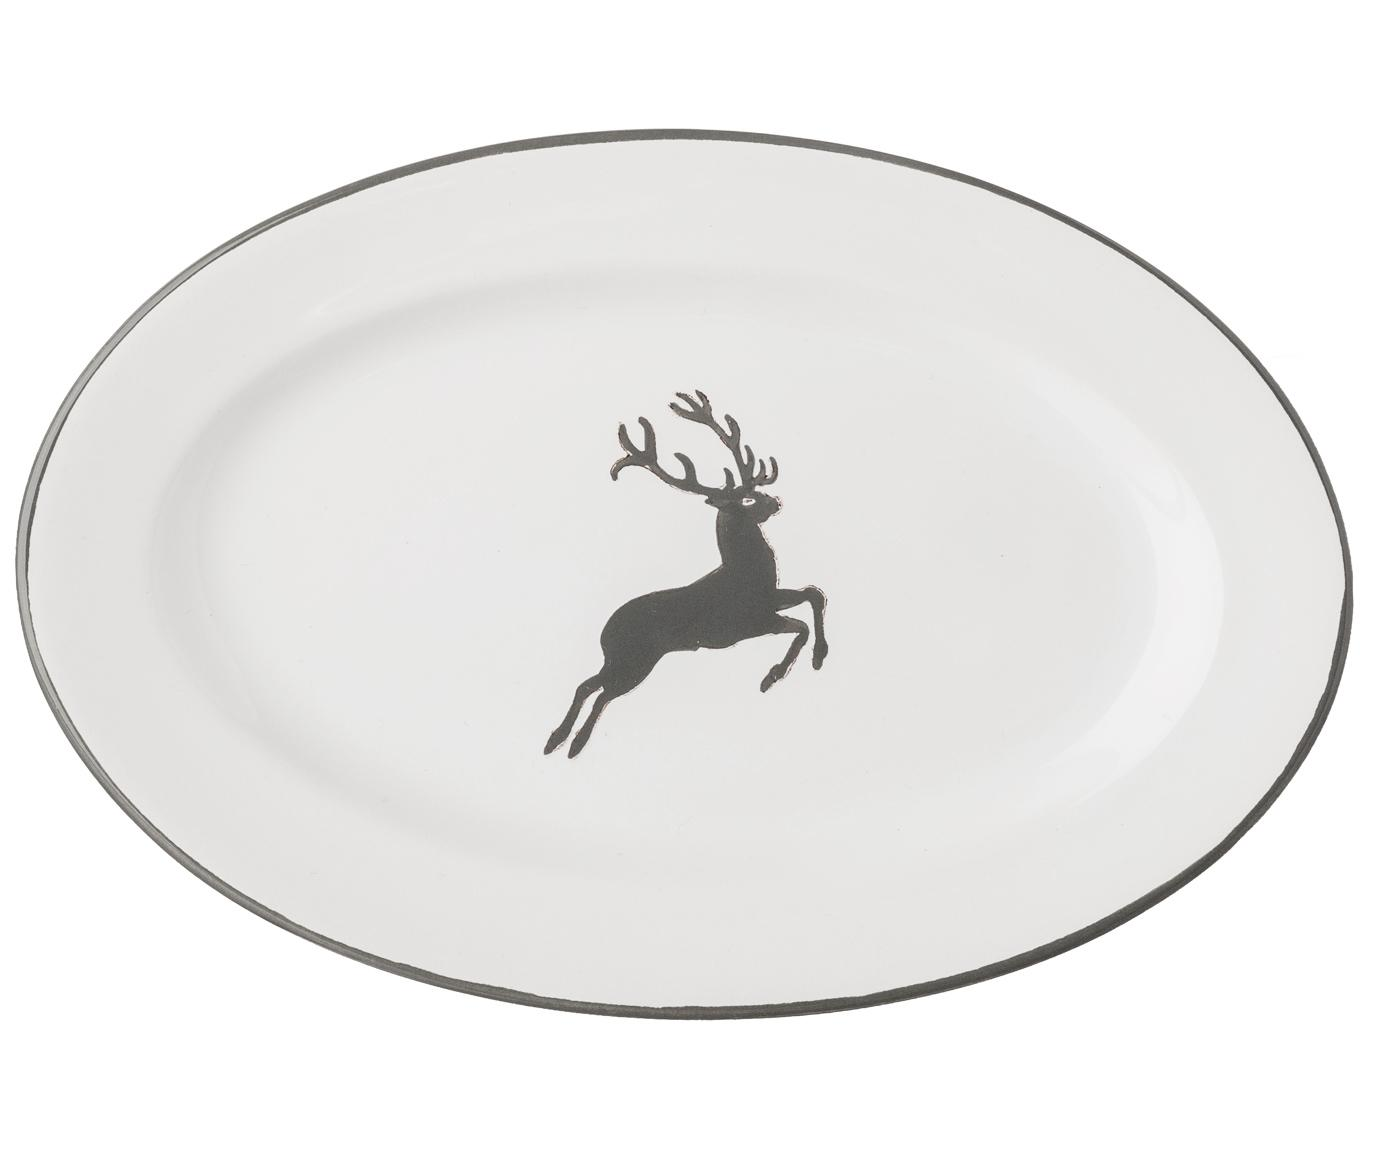 Fuente artesanal Gourmet Grauer Hirsch, Cerámica, Gris, blanco, L 14 x An 21 cm